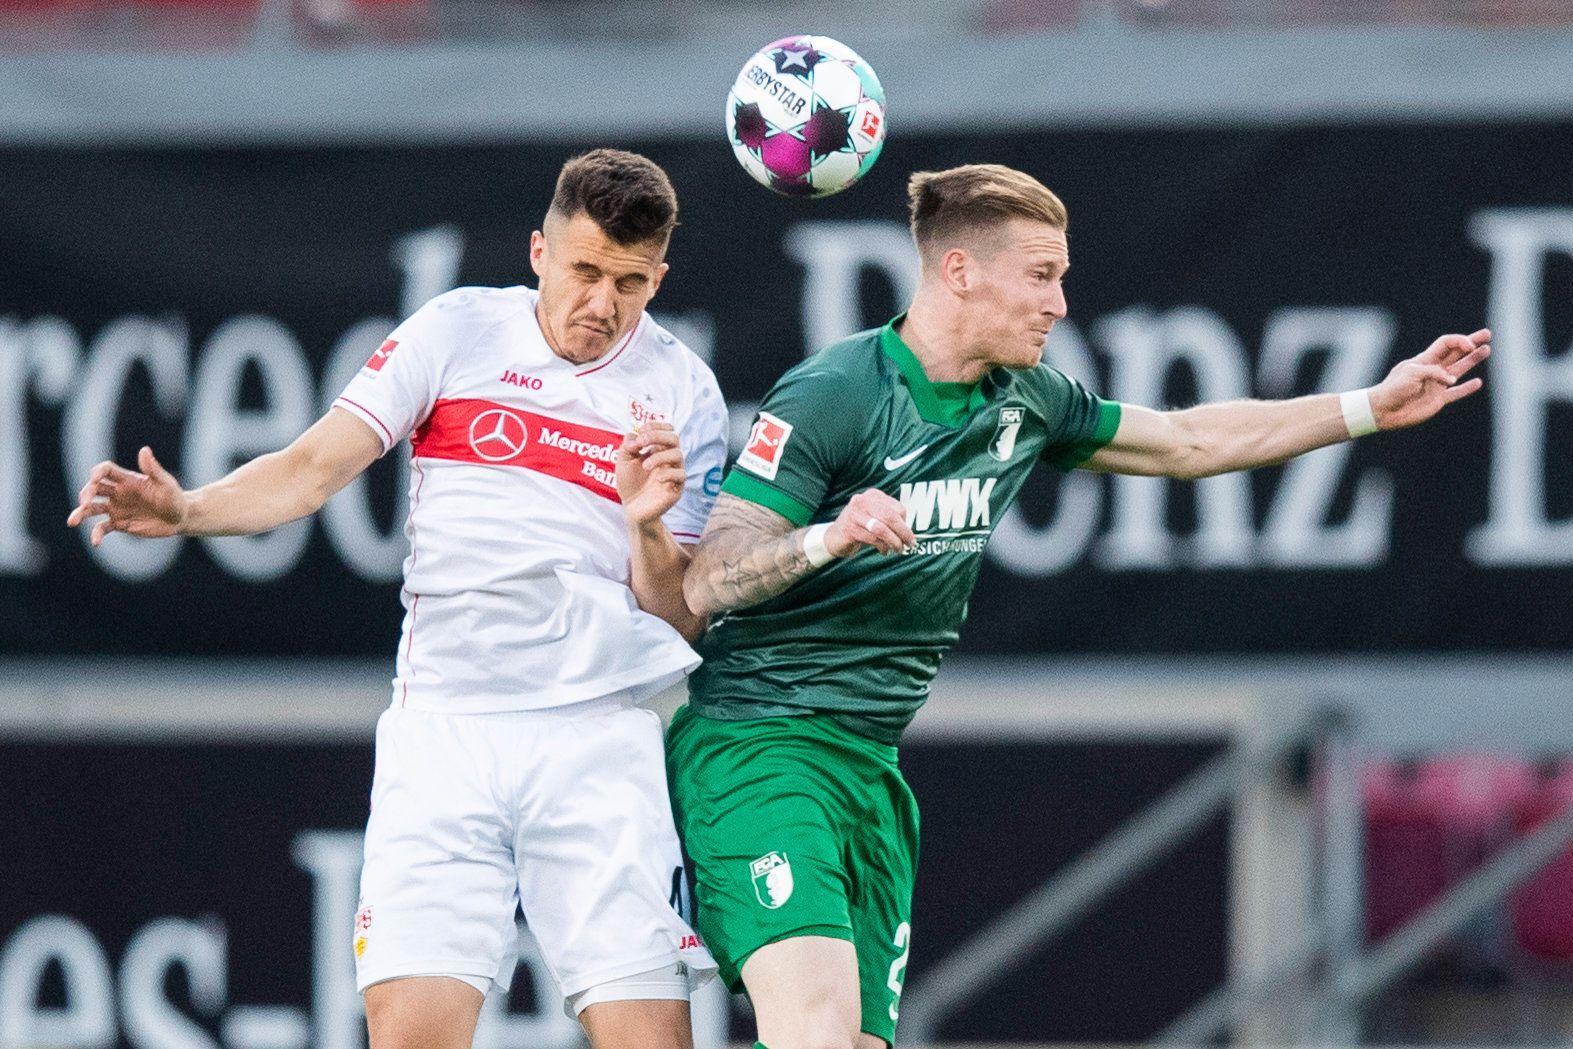 VfB Stuttgart - FC Augsburg